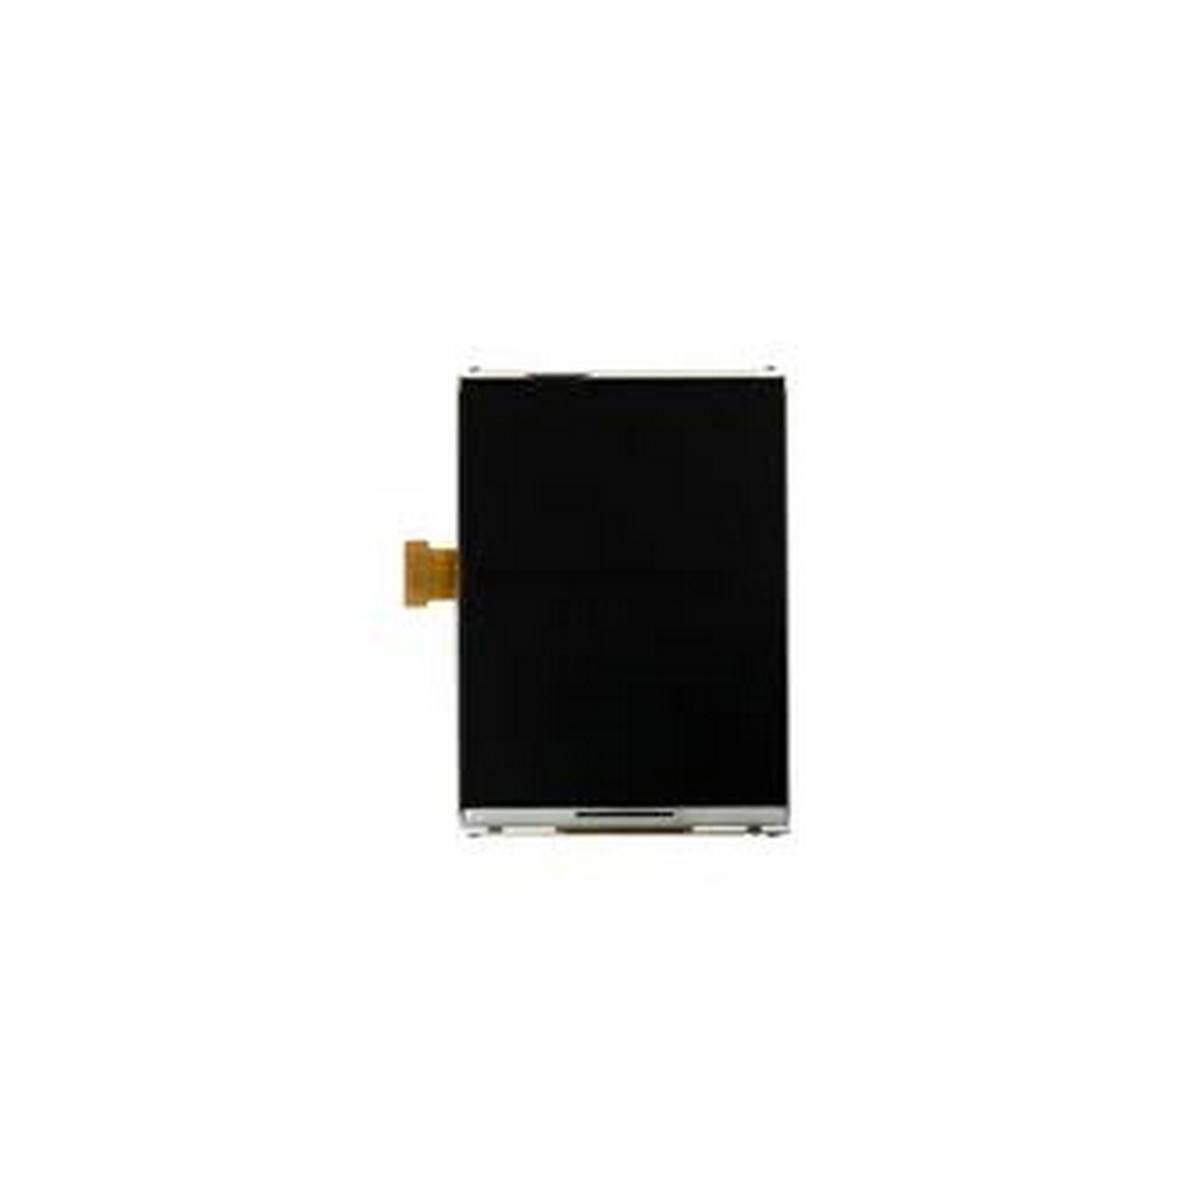 Ecrã LCD Samsung Galaxy Y Duos S6102.